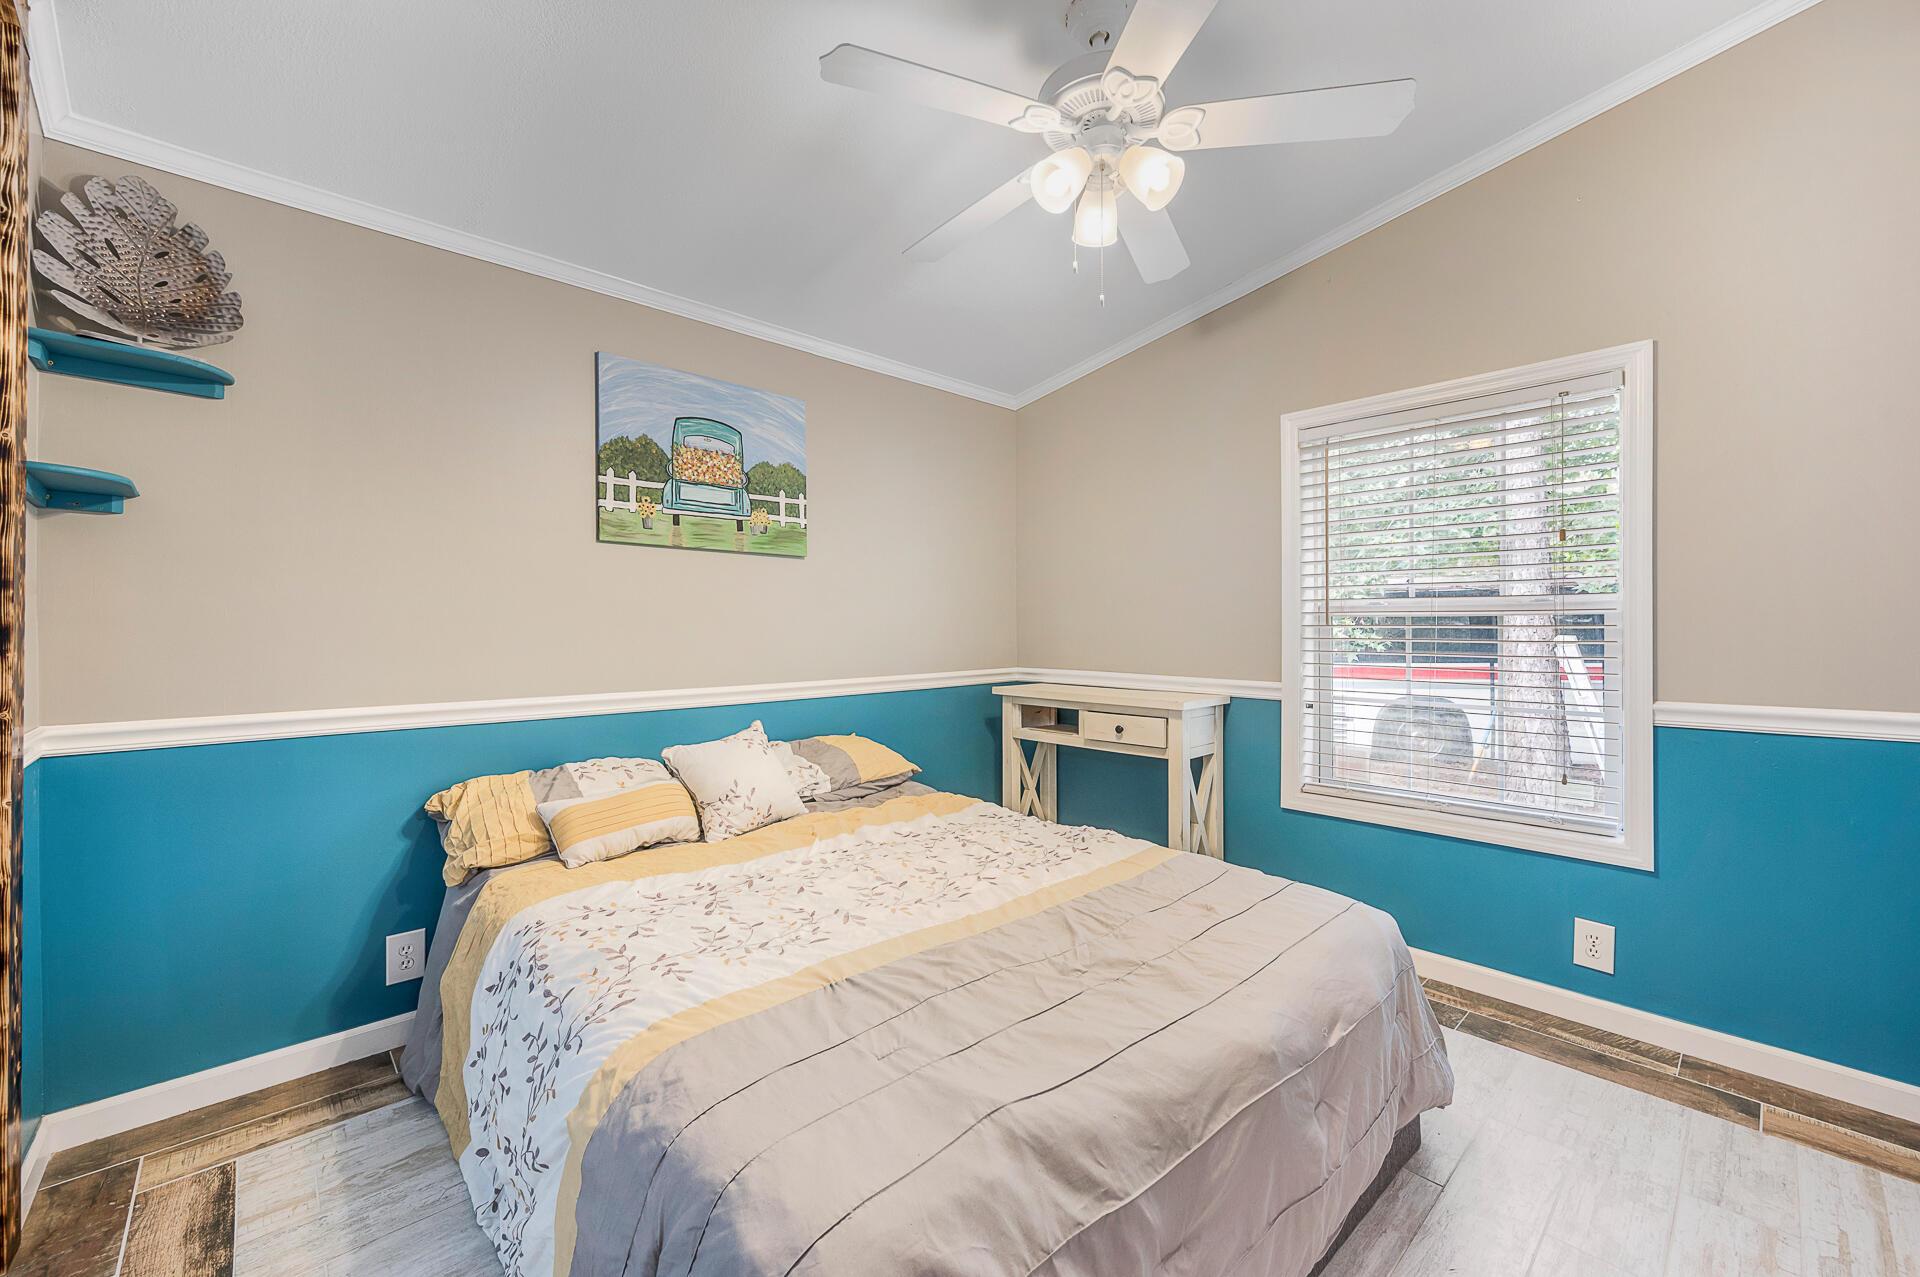 Clemson Terrace Homes For Sale - 250 Medina, Summerville, SC - 16